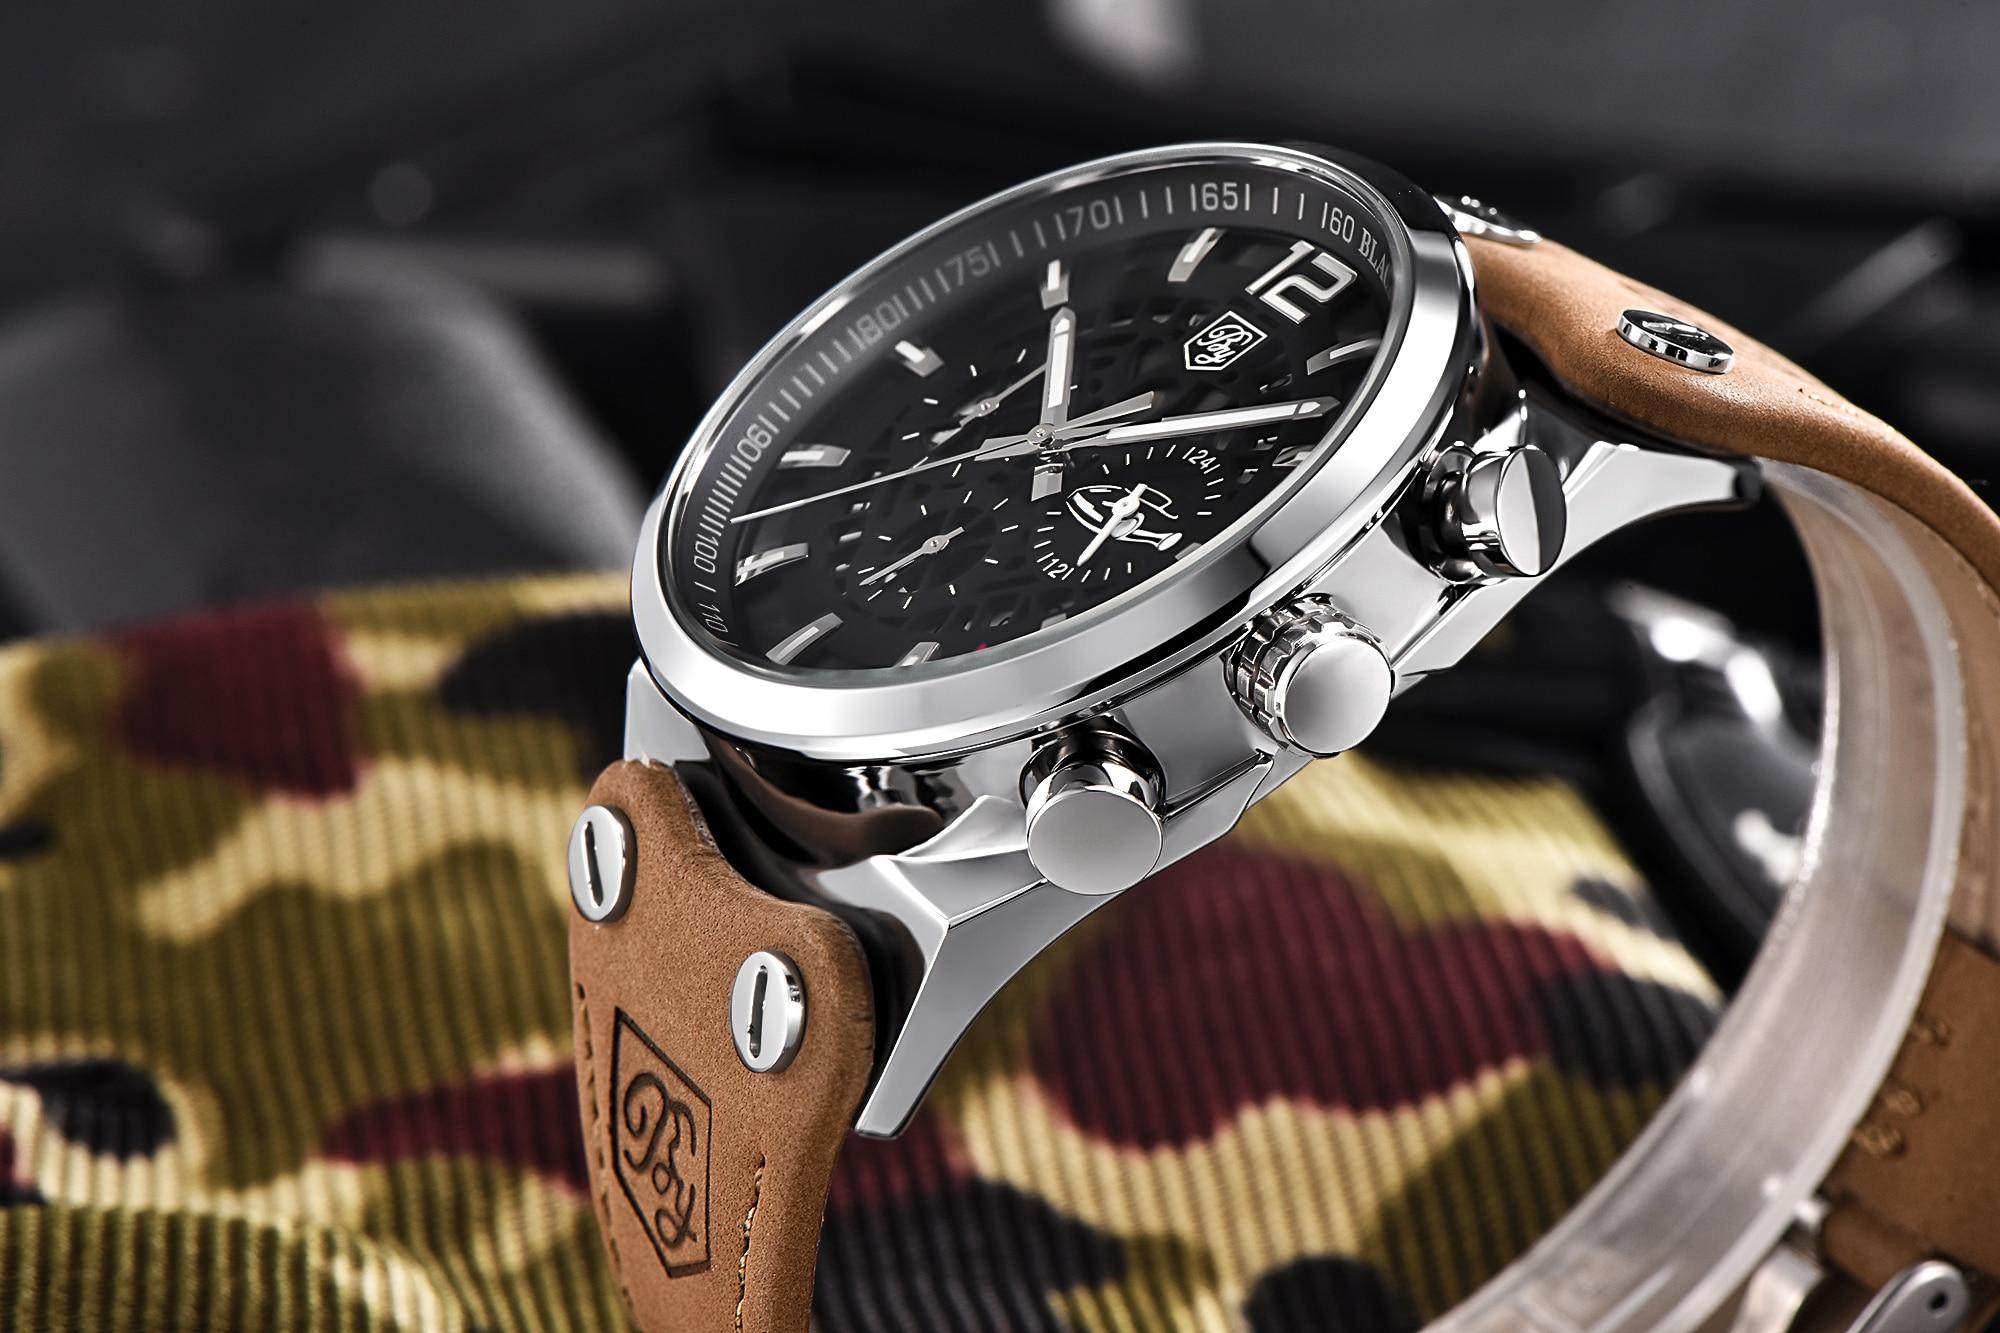 BENYAR Big Dial Sport Watch Men Waterproof Outdoor Military Chronograph Quartz Leather Watch Army Male Clock Relogio Masculino 4